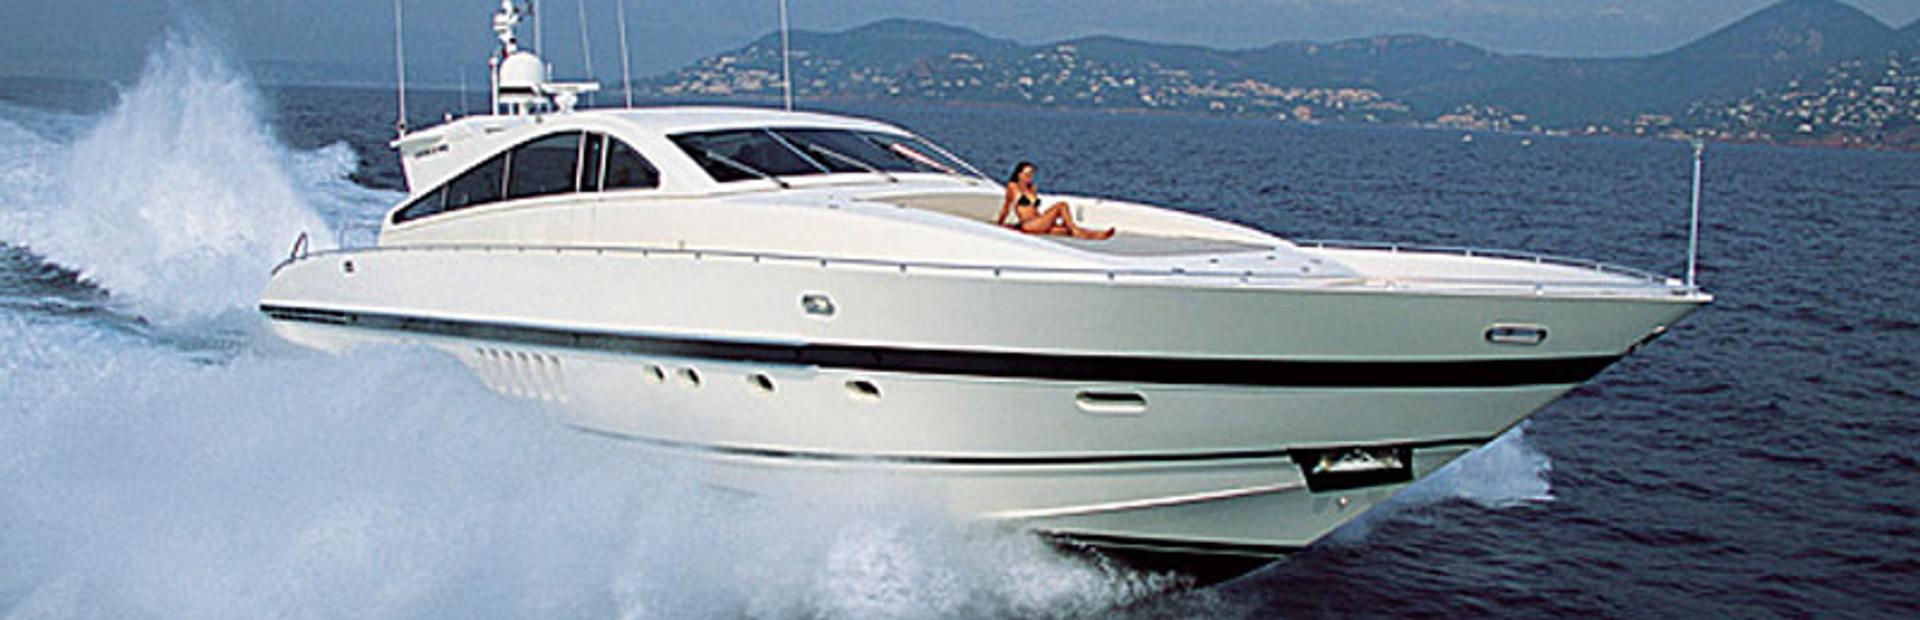 Leopard 27 Yacht Charter